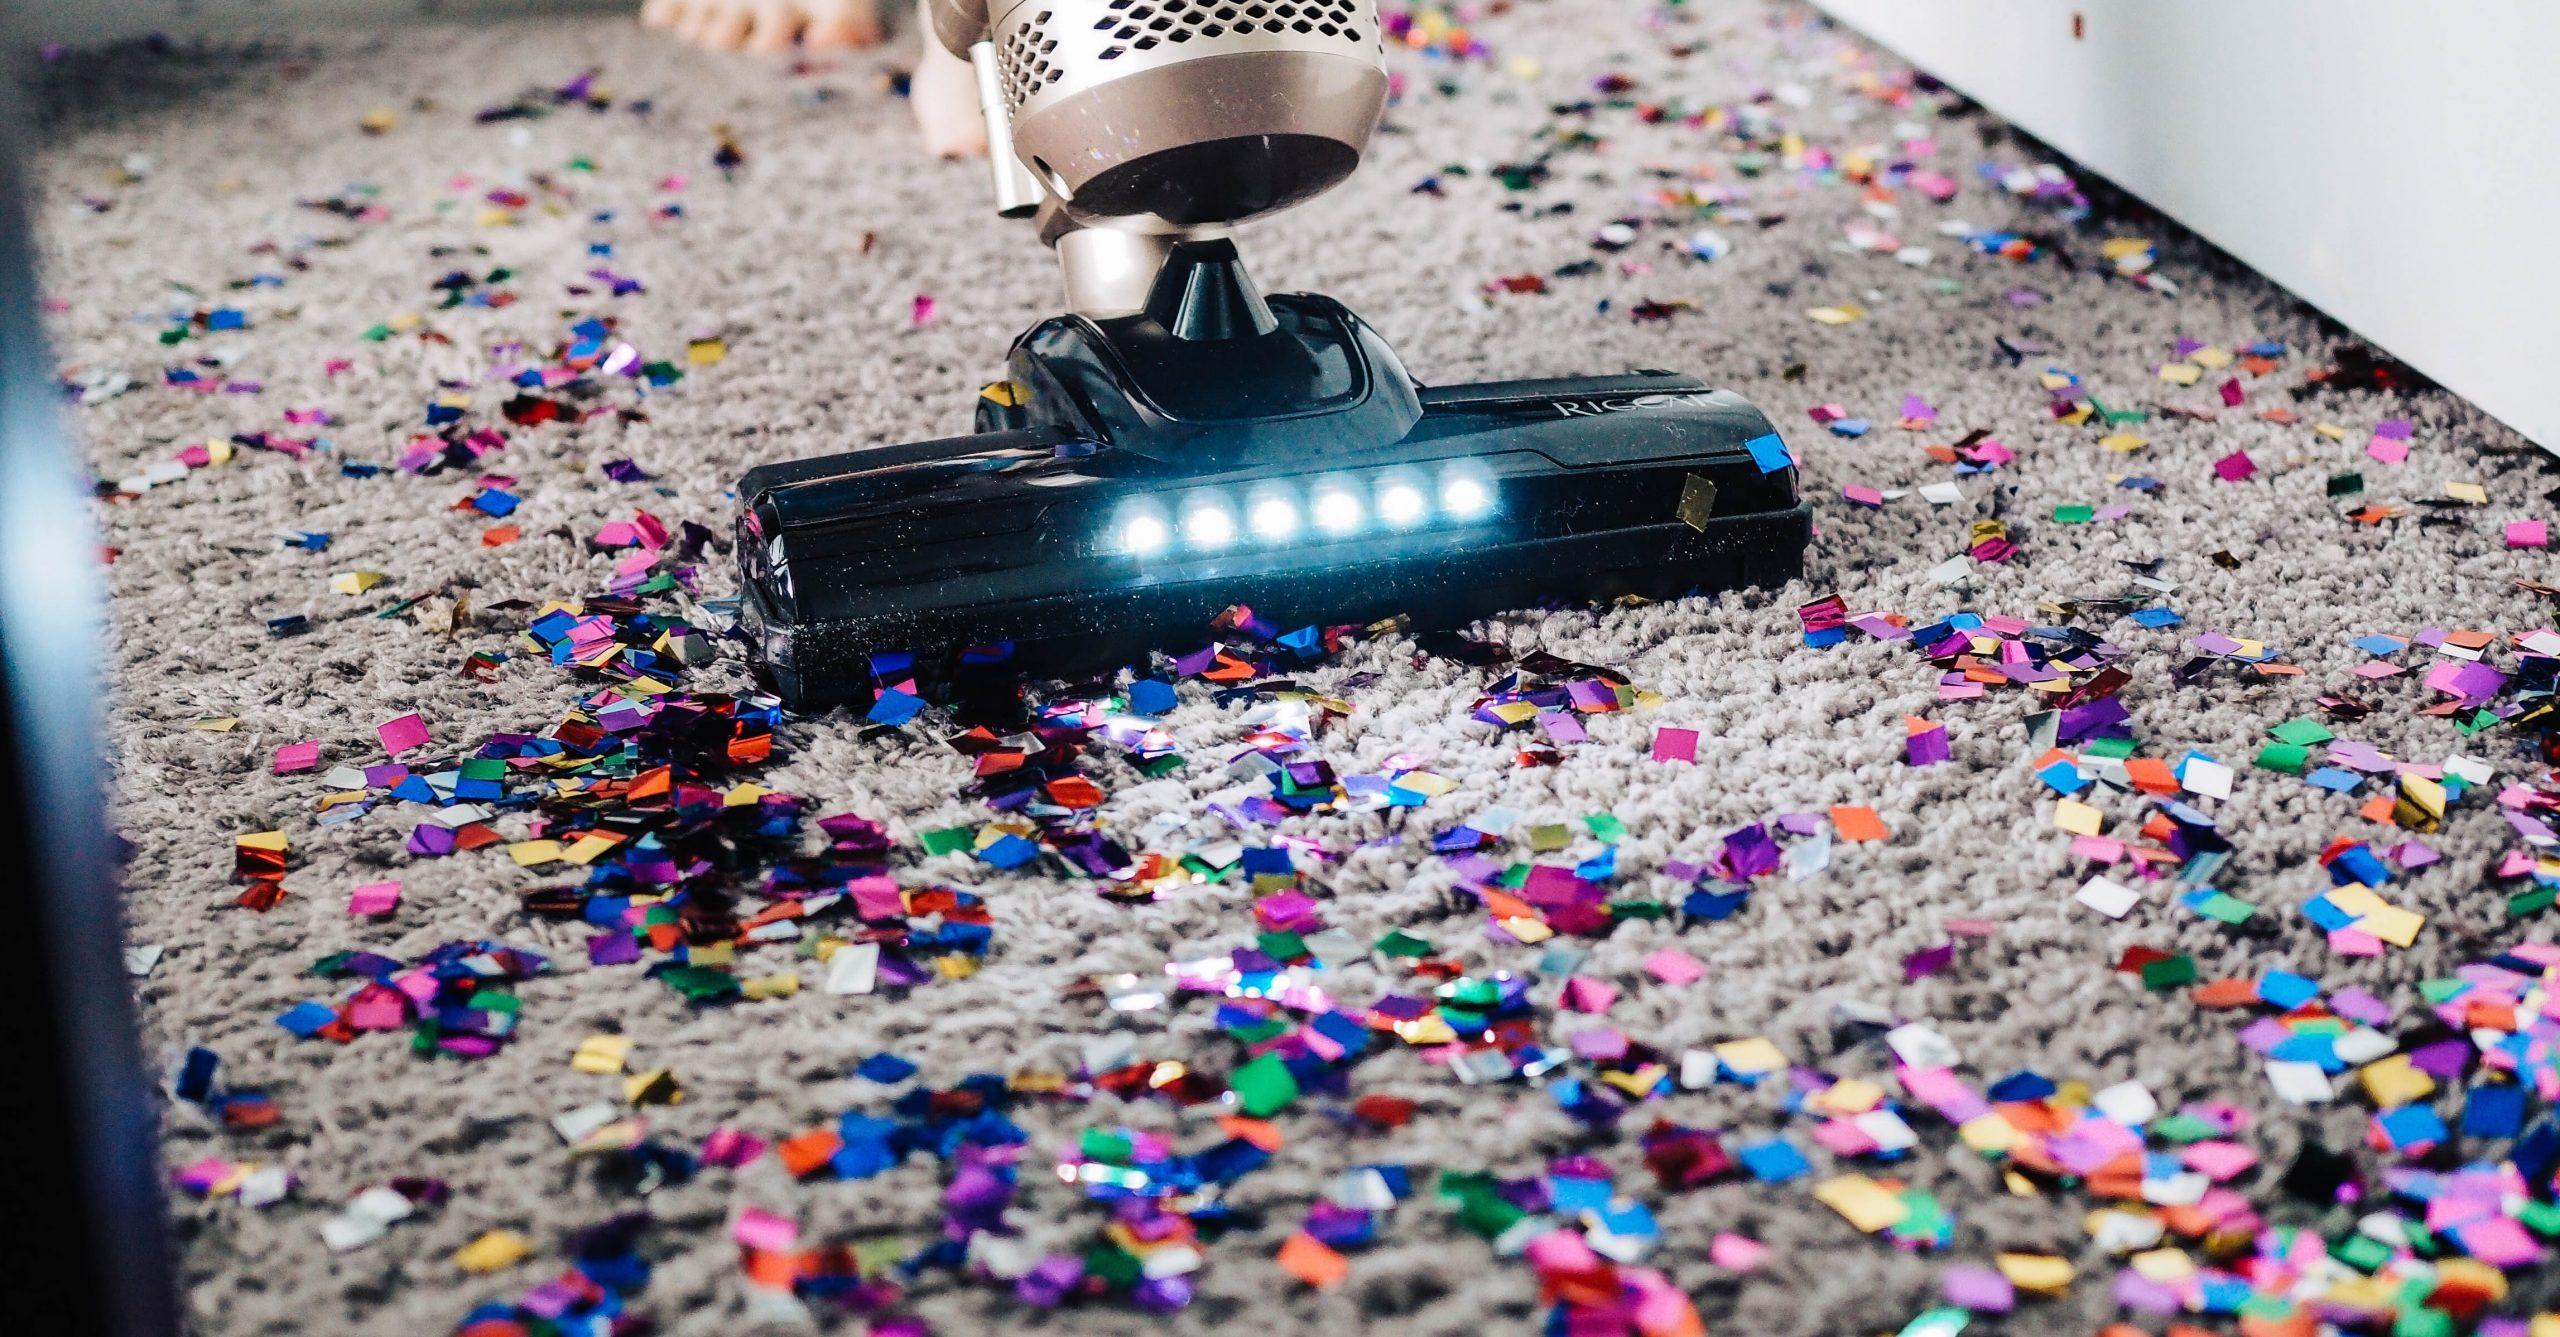 vaccuming confetti marketing spring clean